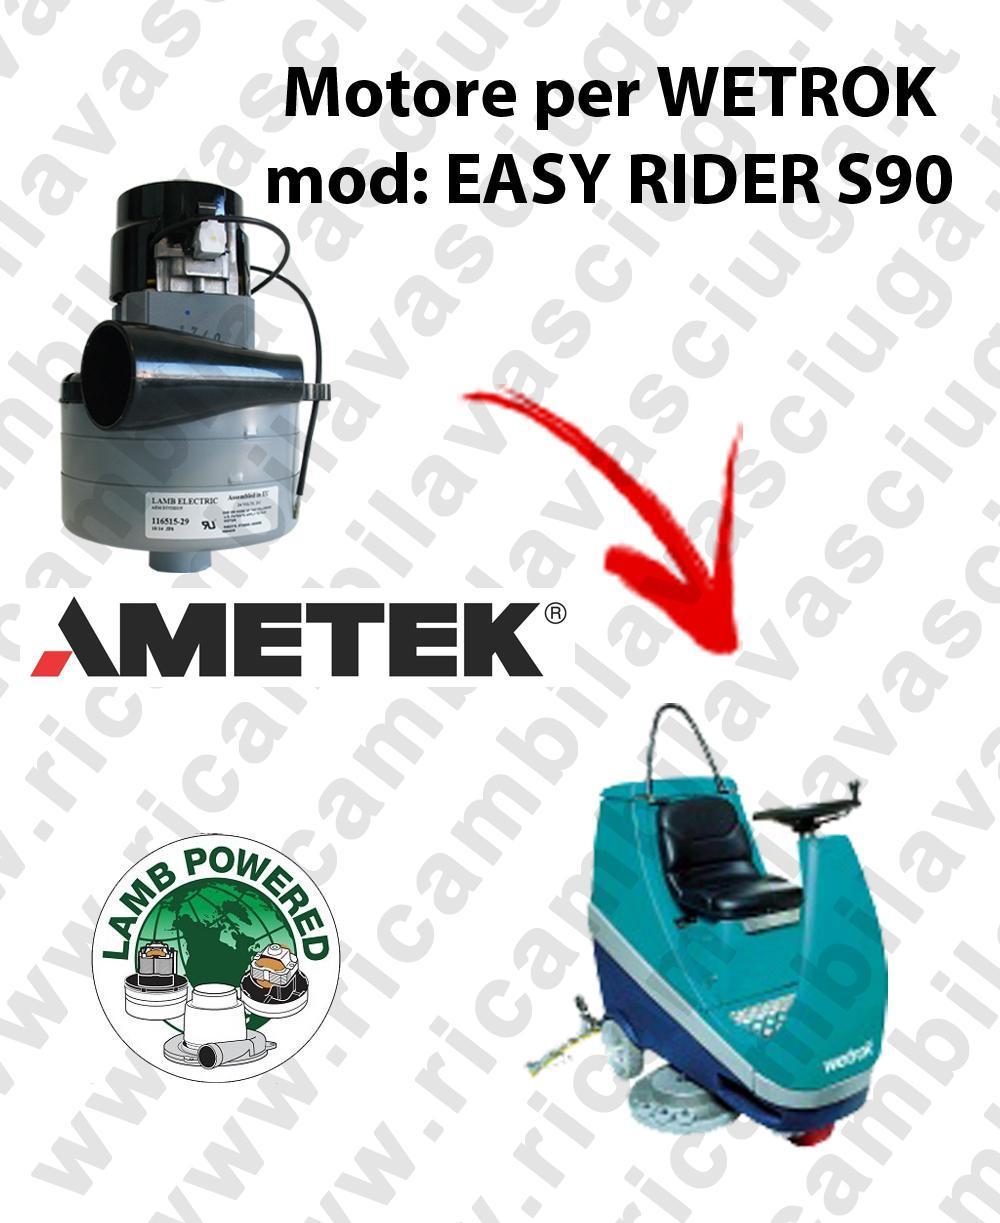 EASY RIDER S90 Saugmotor LAMB AMETEK für scheuersaugmaschinen WETROK